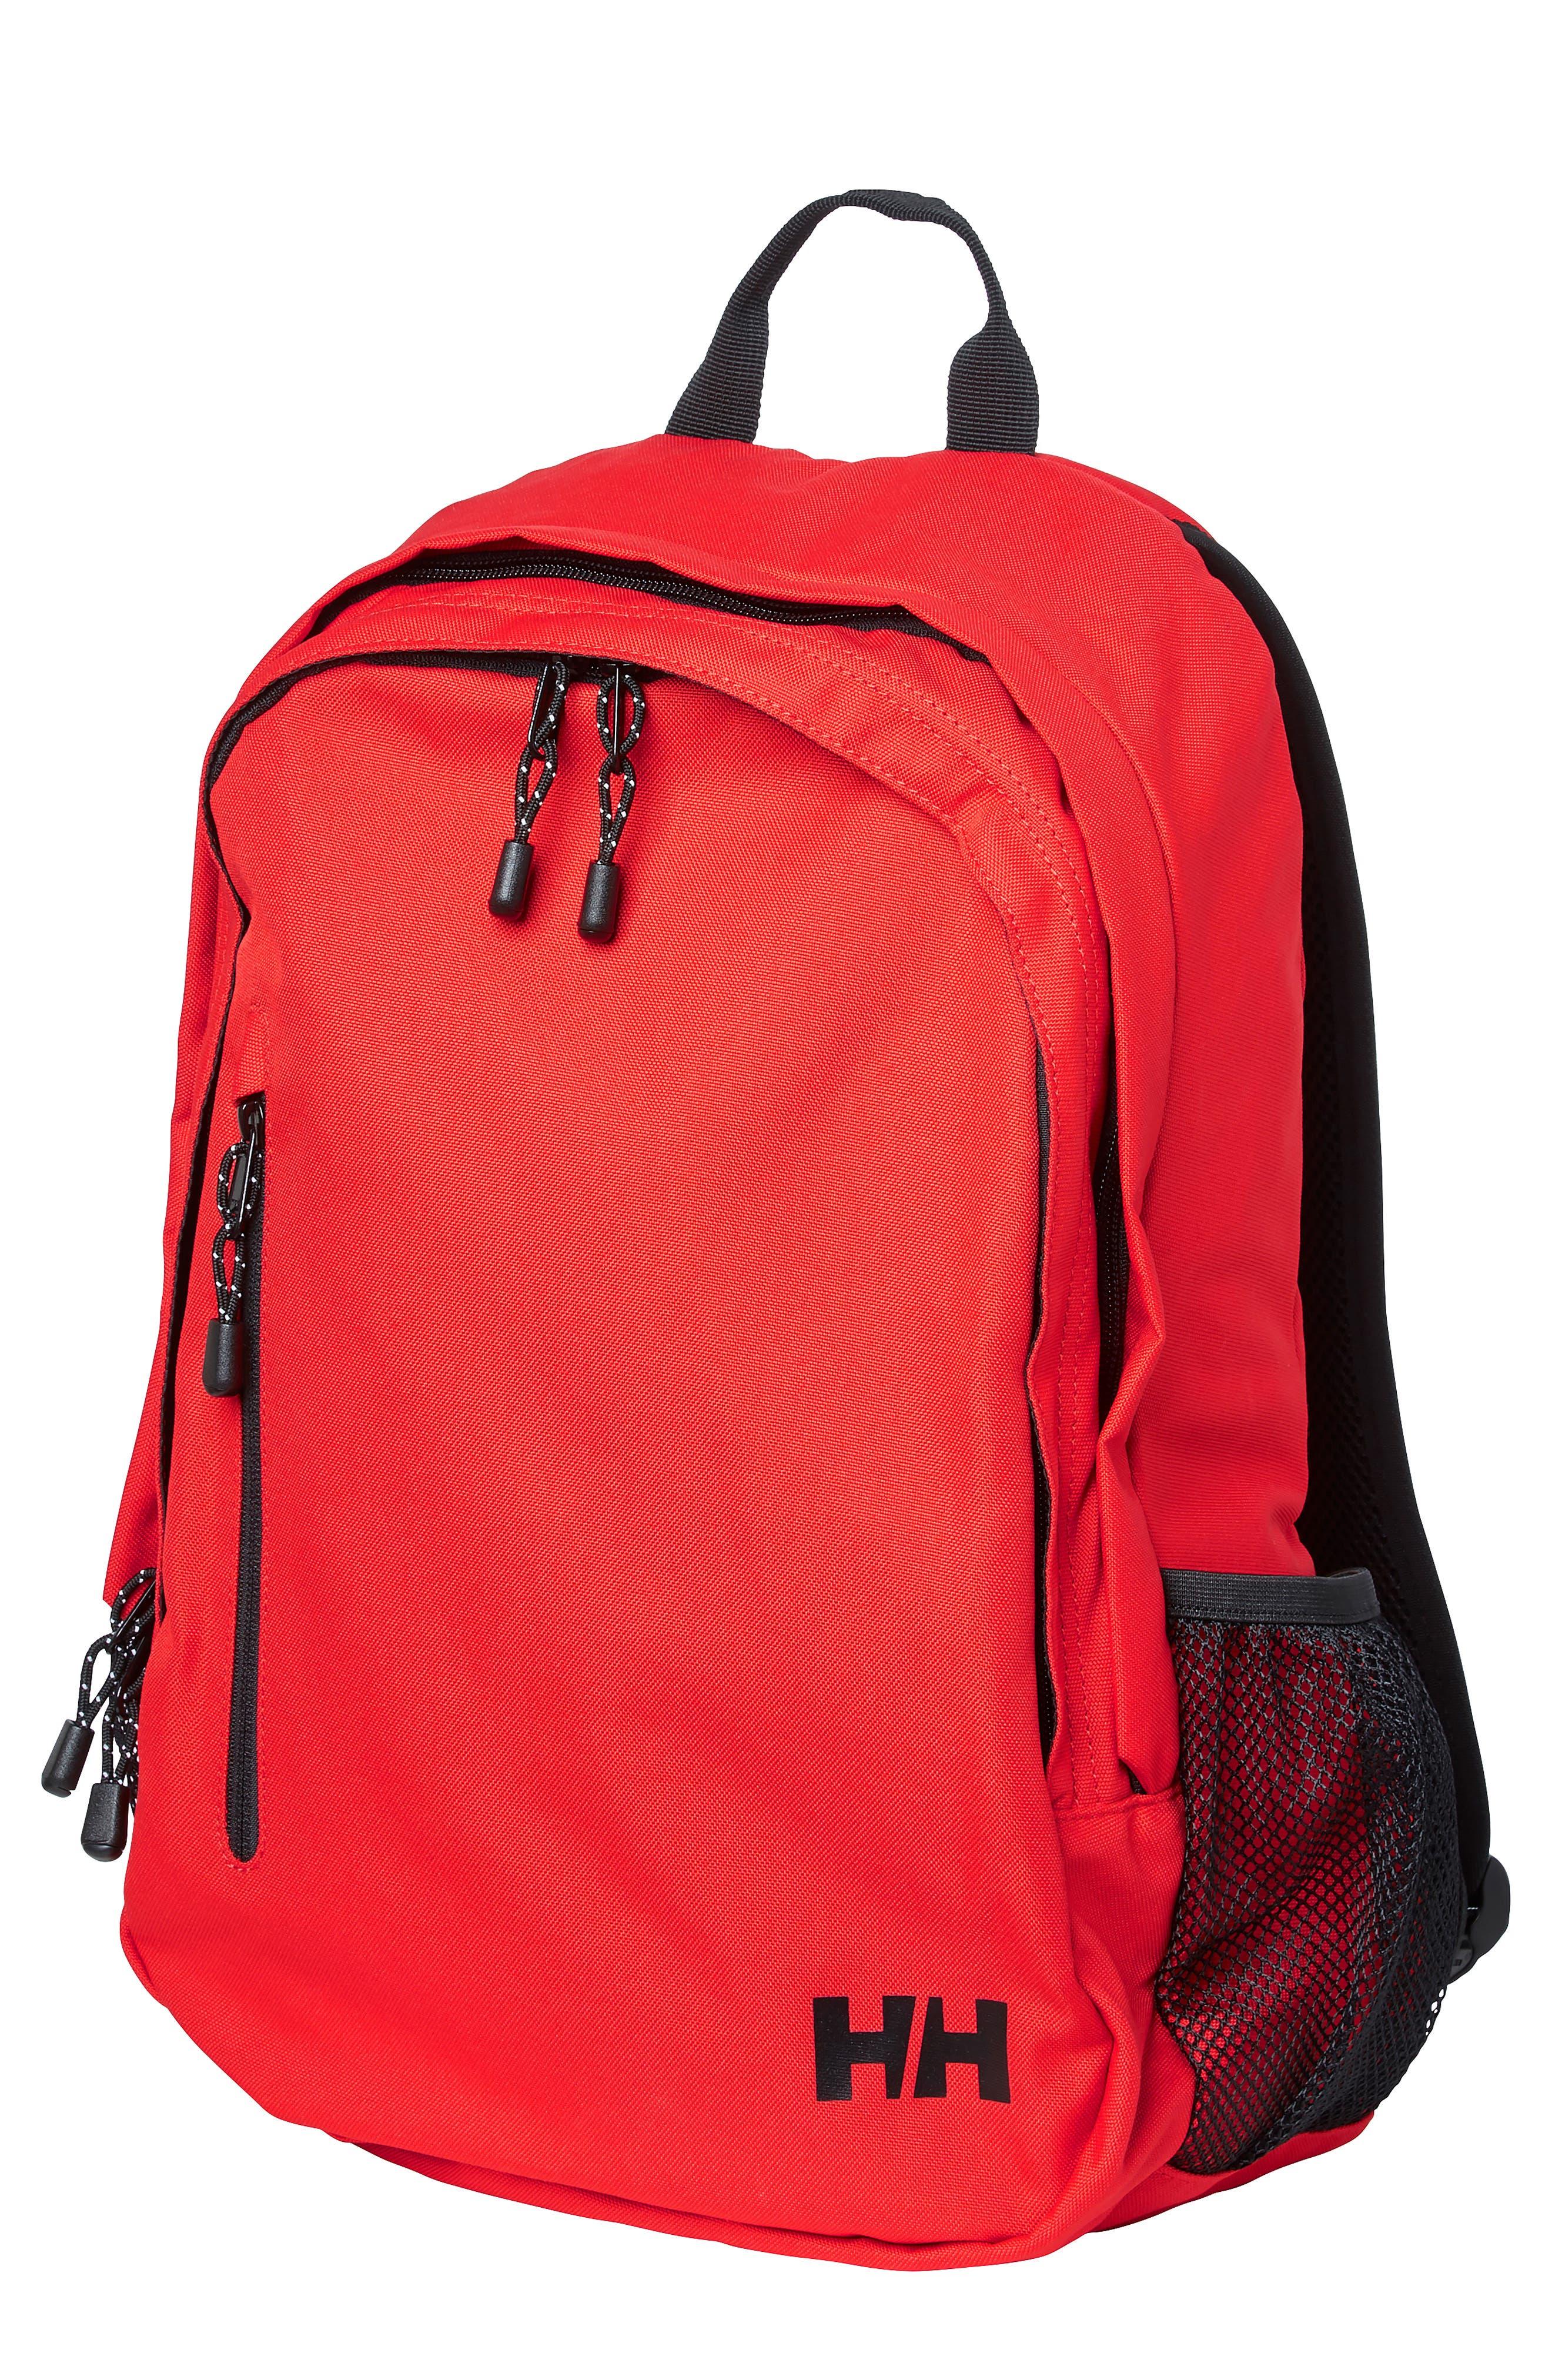 HELLY HANSEN Dublin Backpack, Main, color, ALERT RED